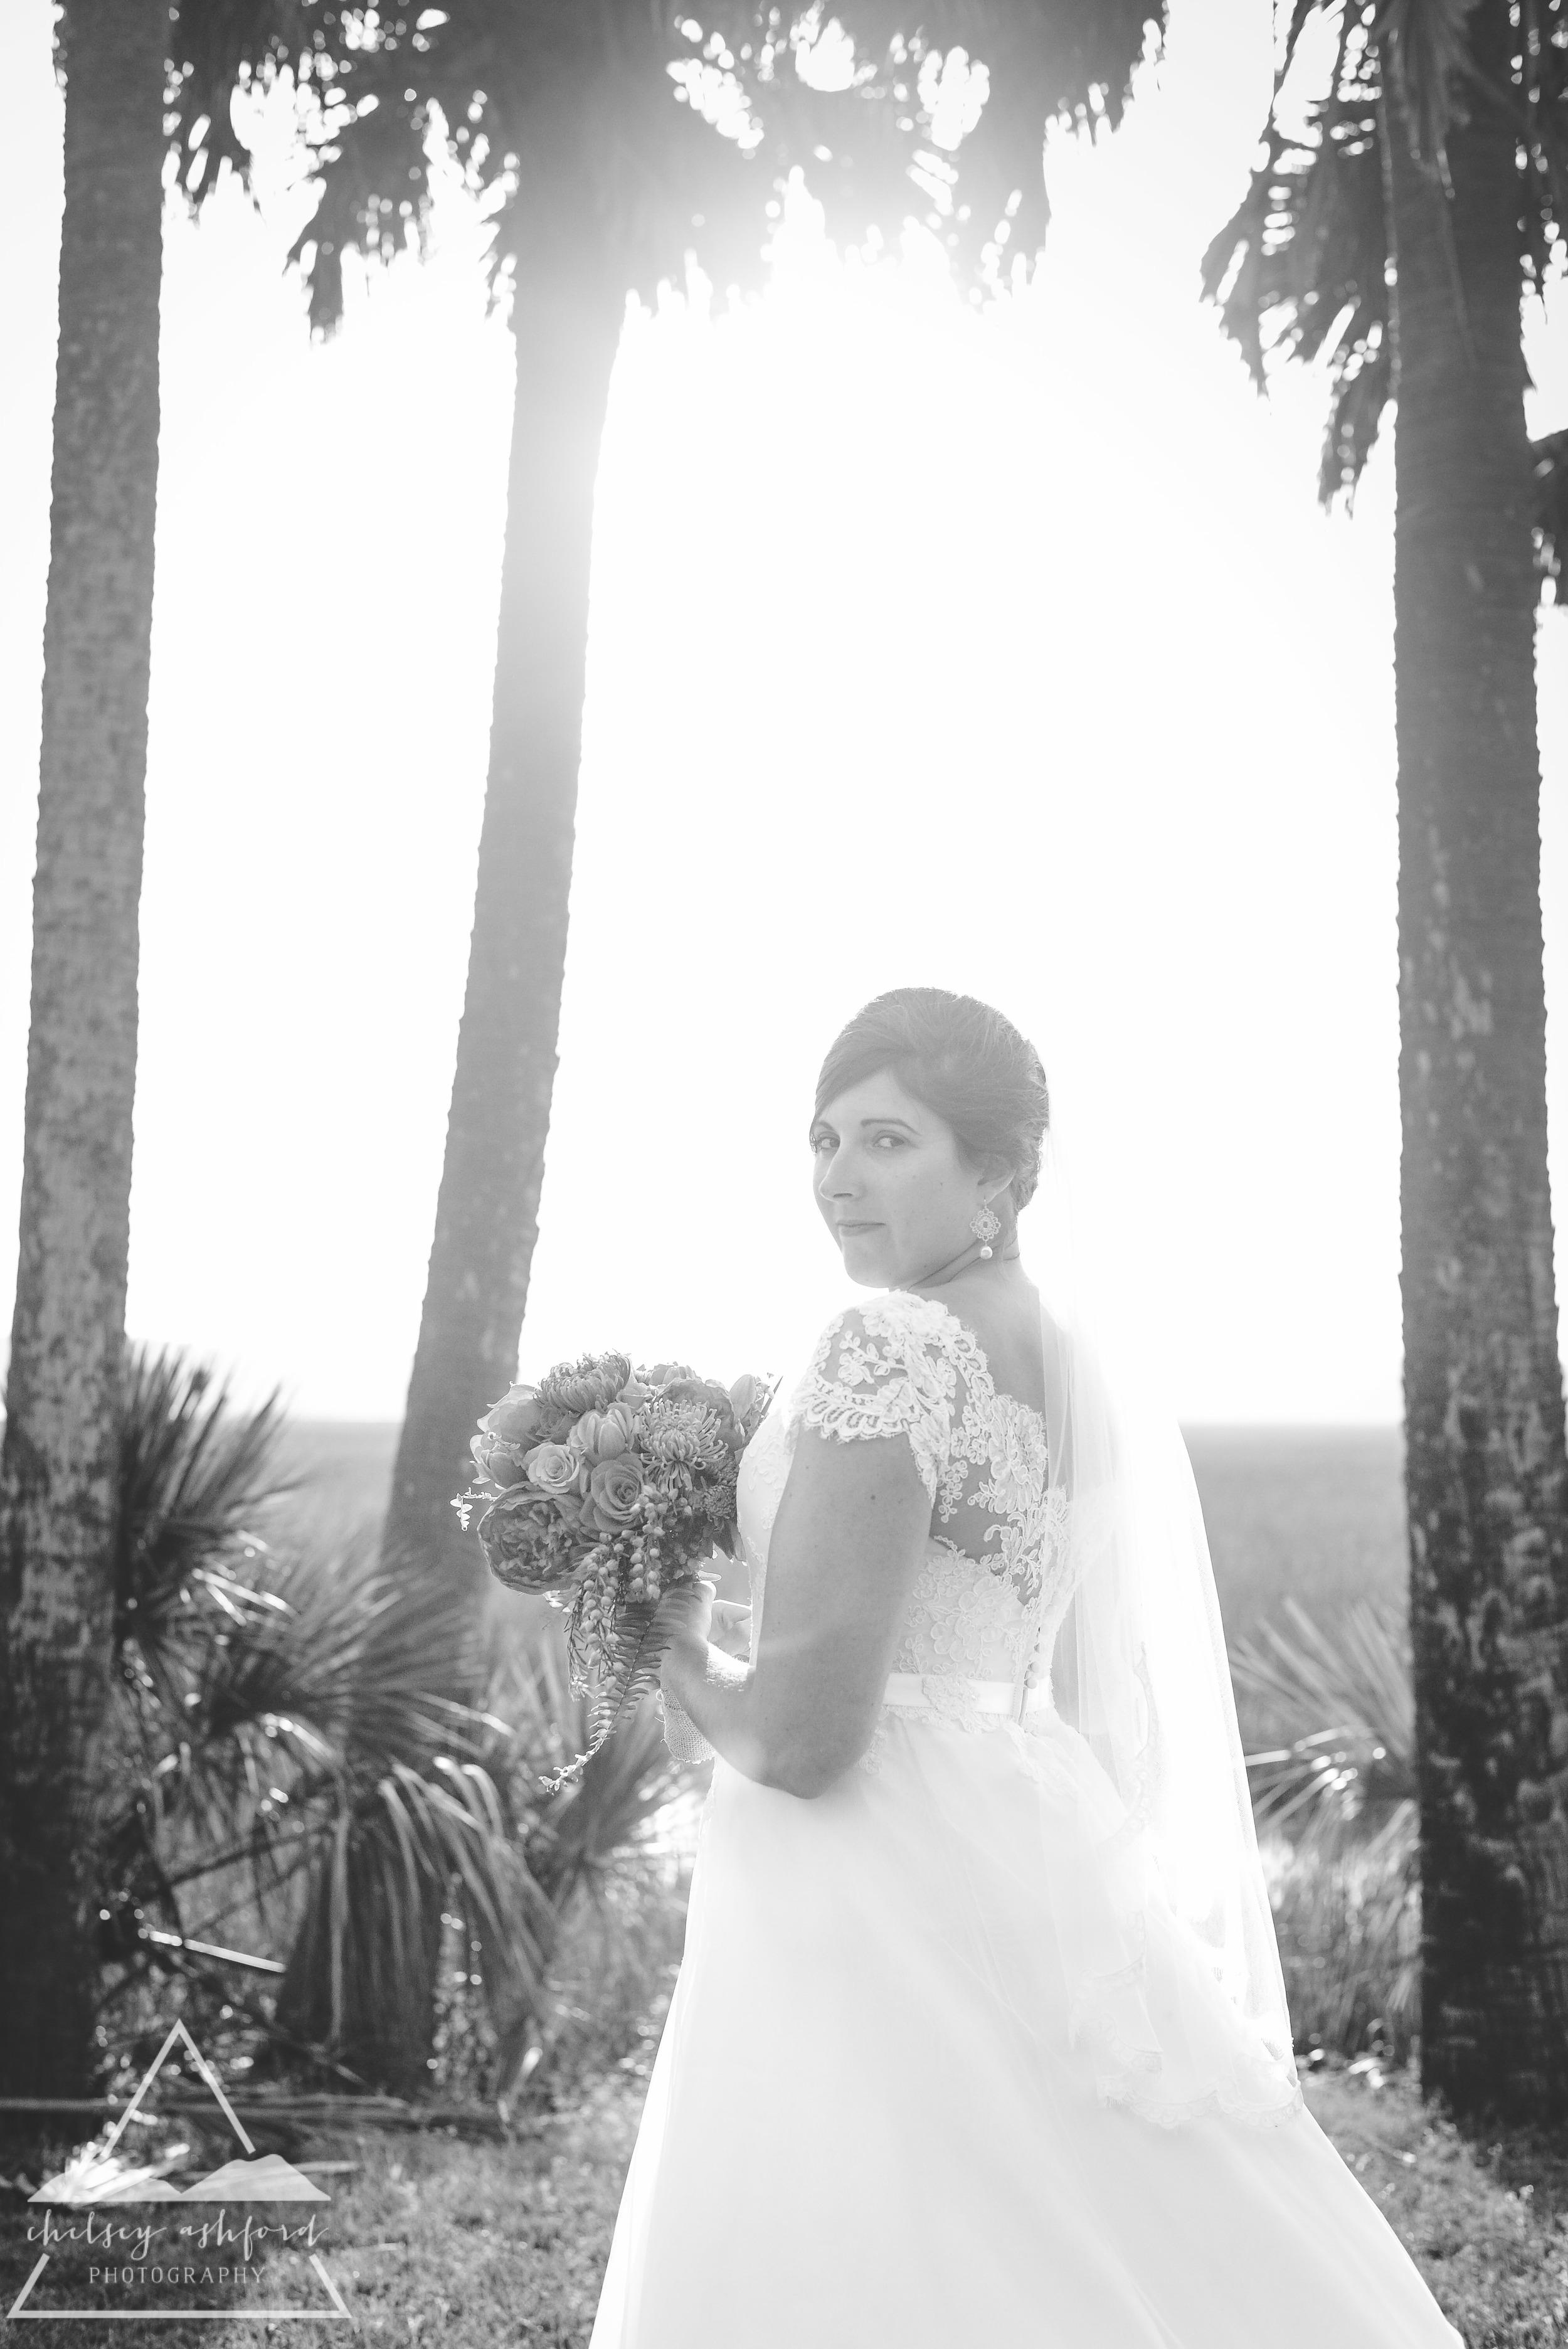 Sylvia_bridals_web-26.jpg